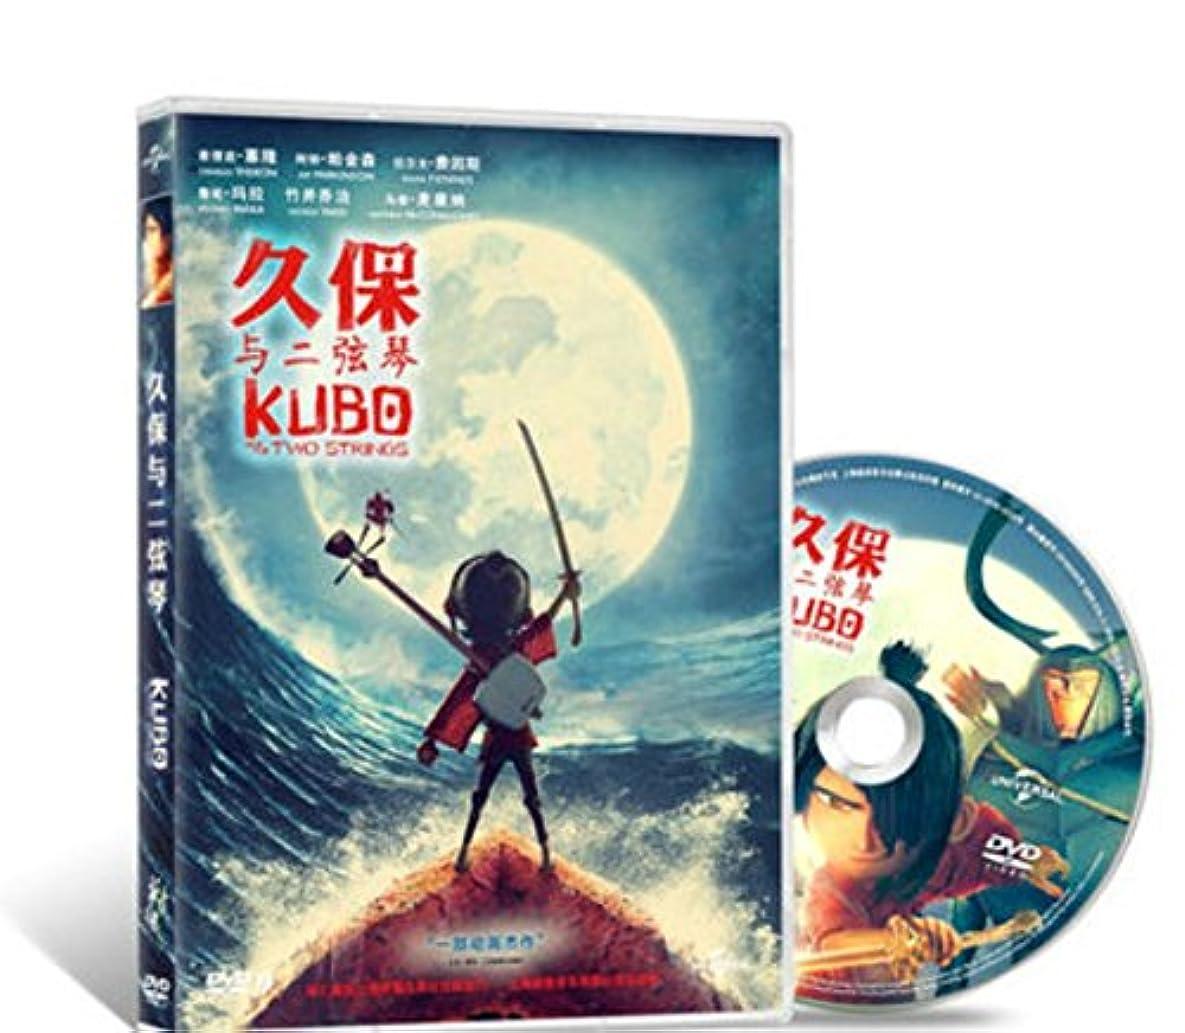 魔弦传说(Kubo and the Two Strings) 中国正規版DVD 言語学び